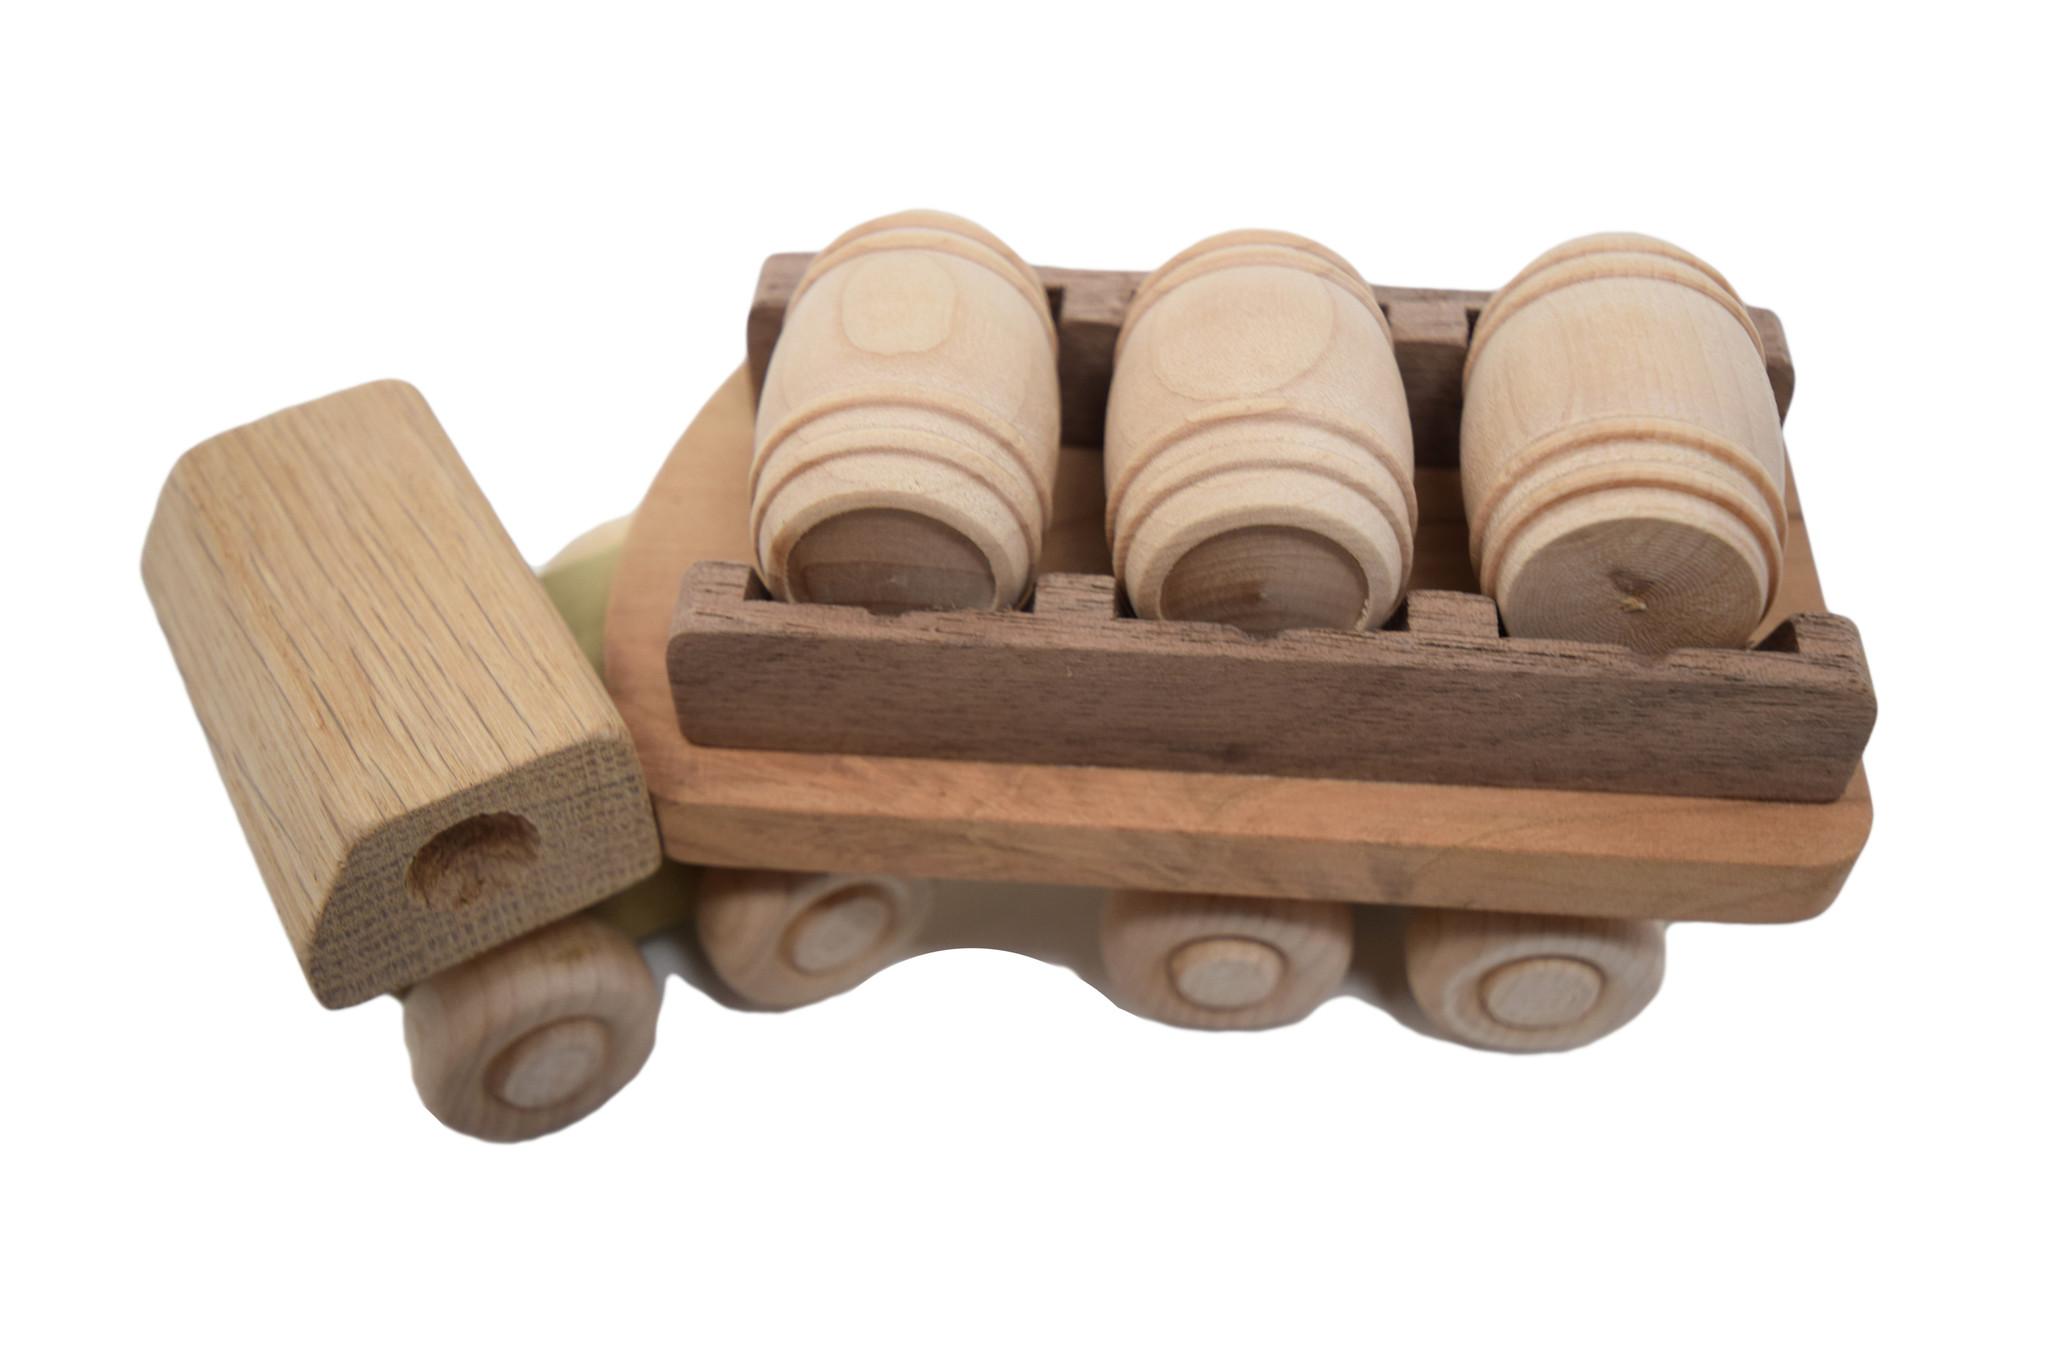 Wooden Barrel Truck Toy-1